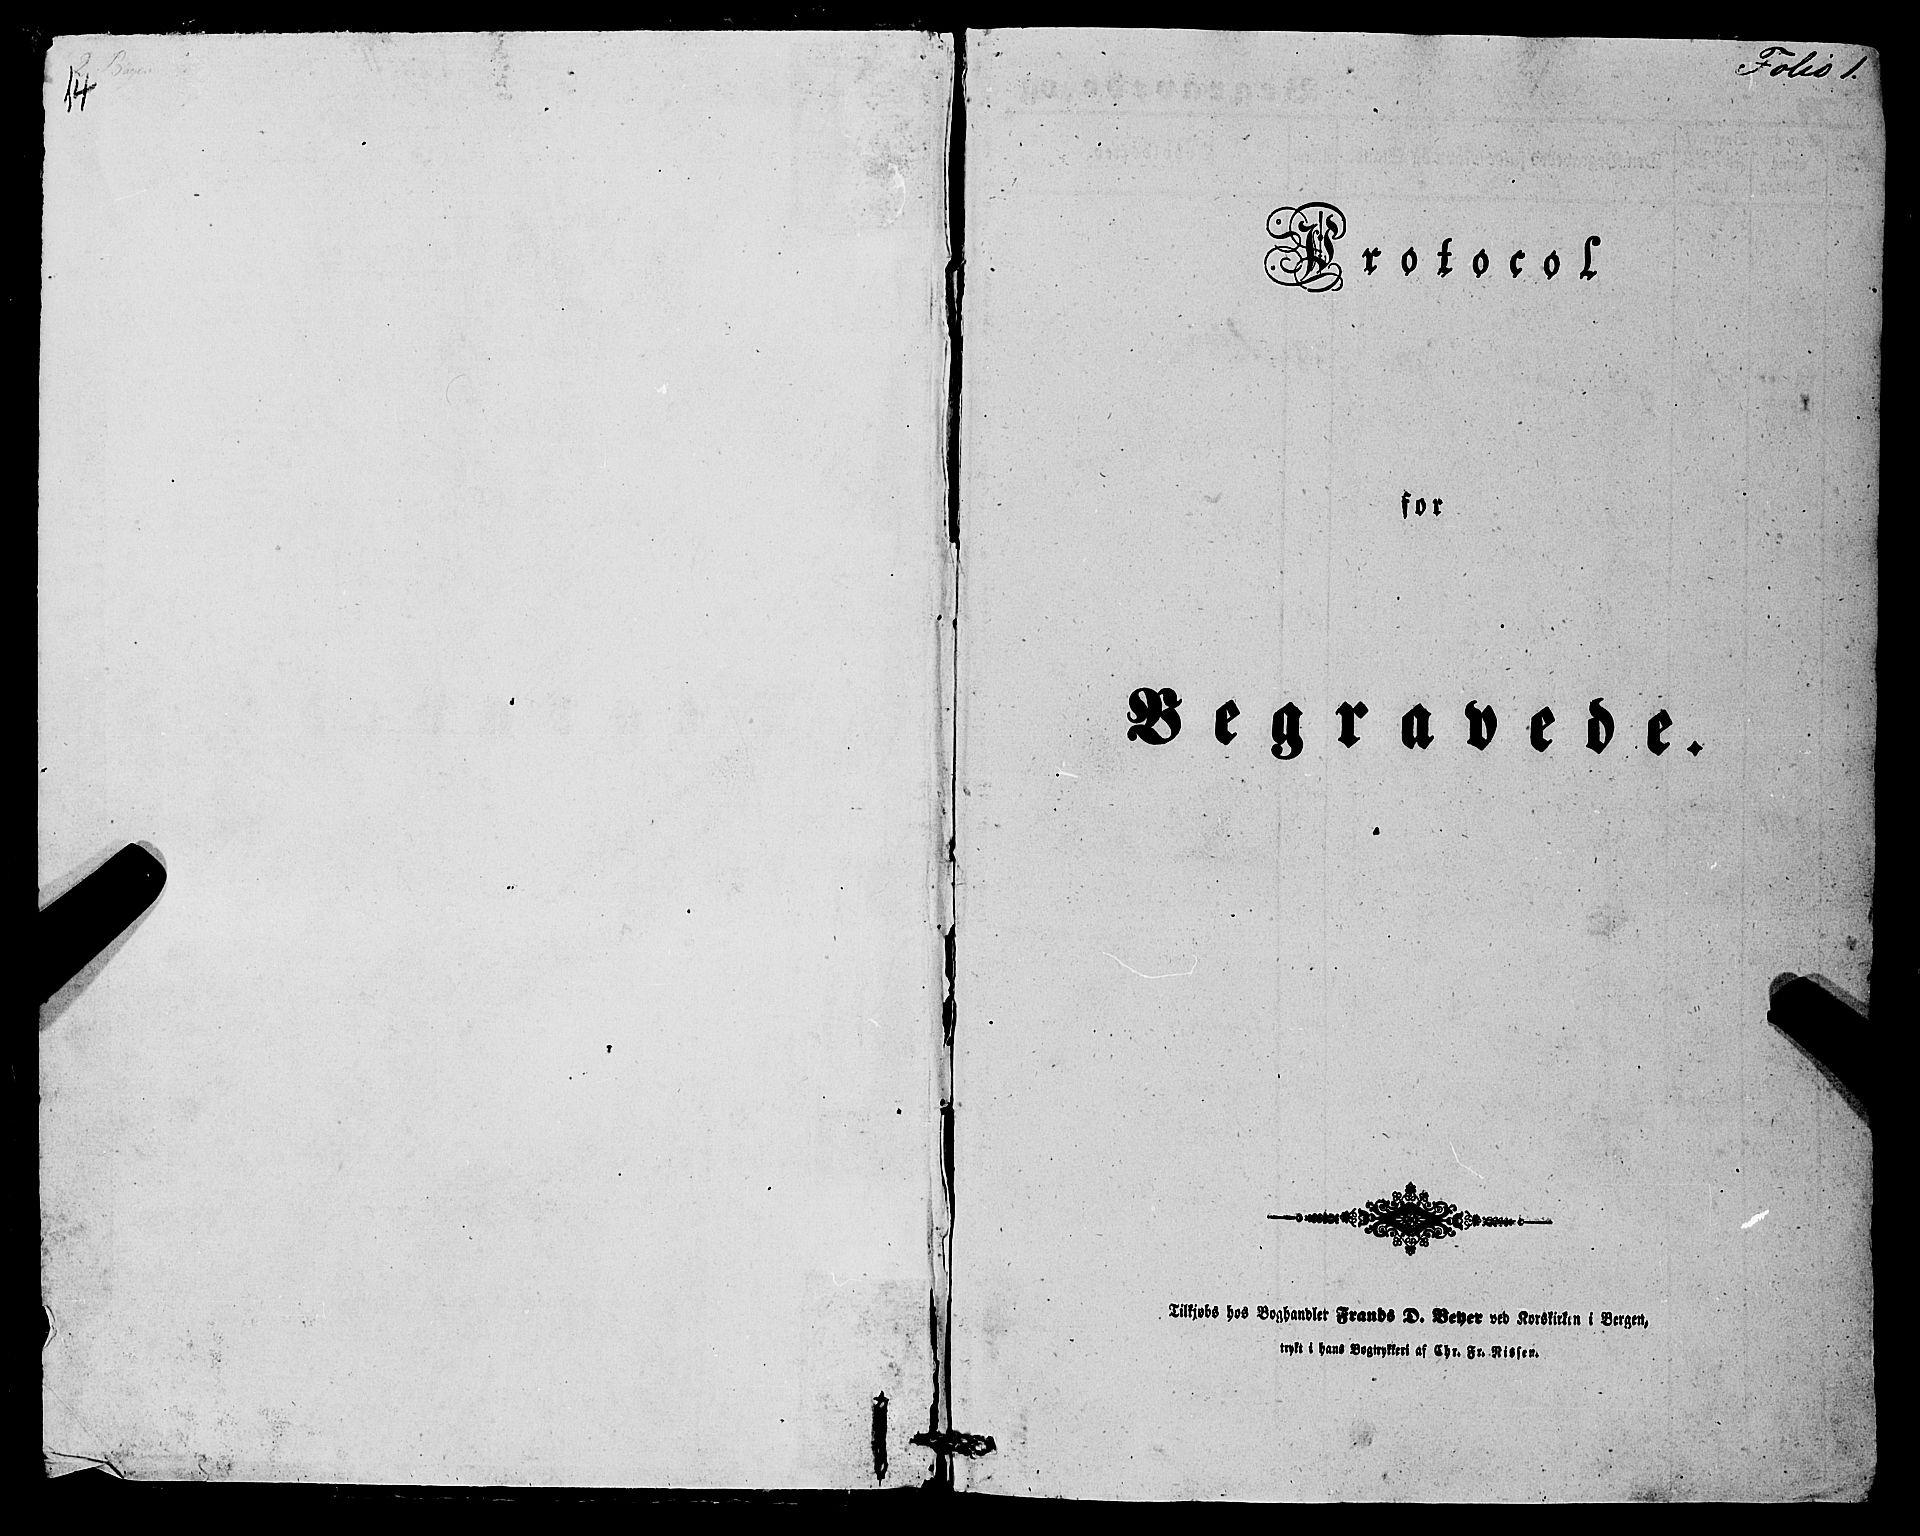 SAB, Lindås Sokneprestembete, H/Haa: Ministerialbok nr. A 15, 1848-1862, s. 1